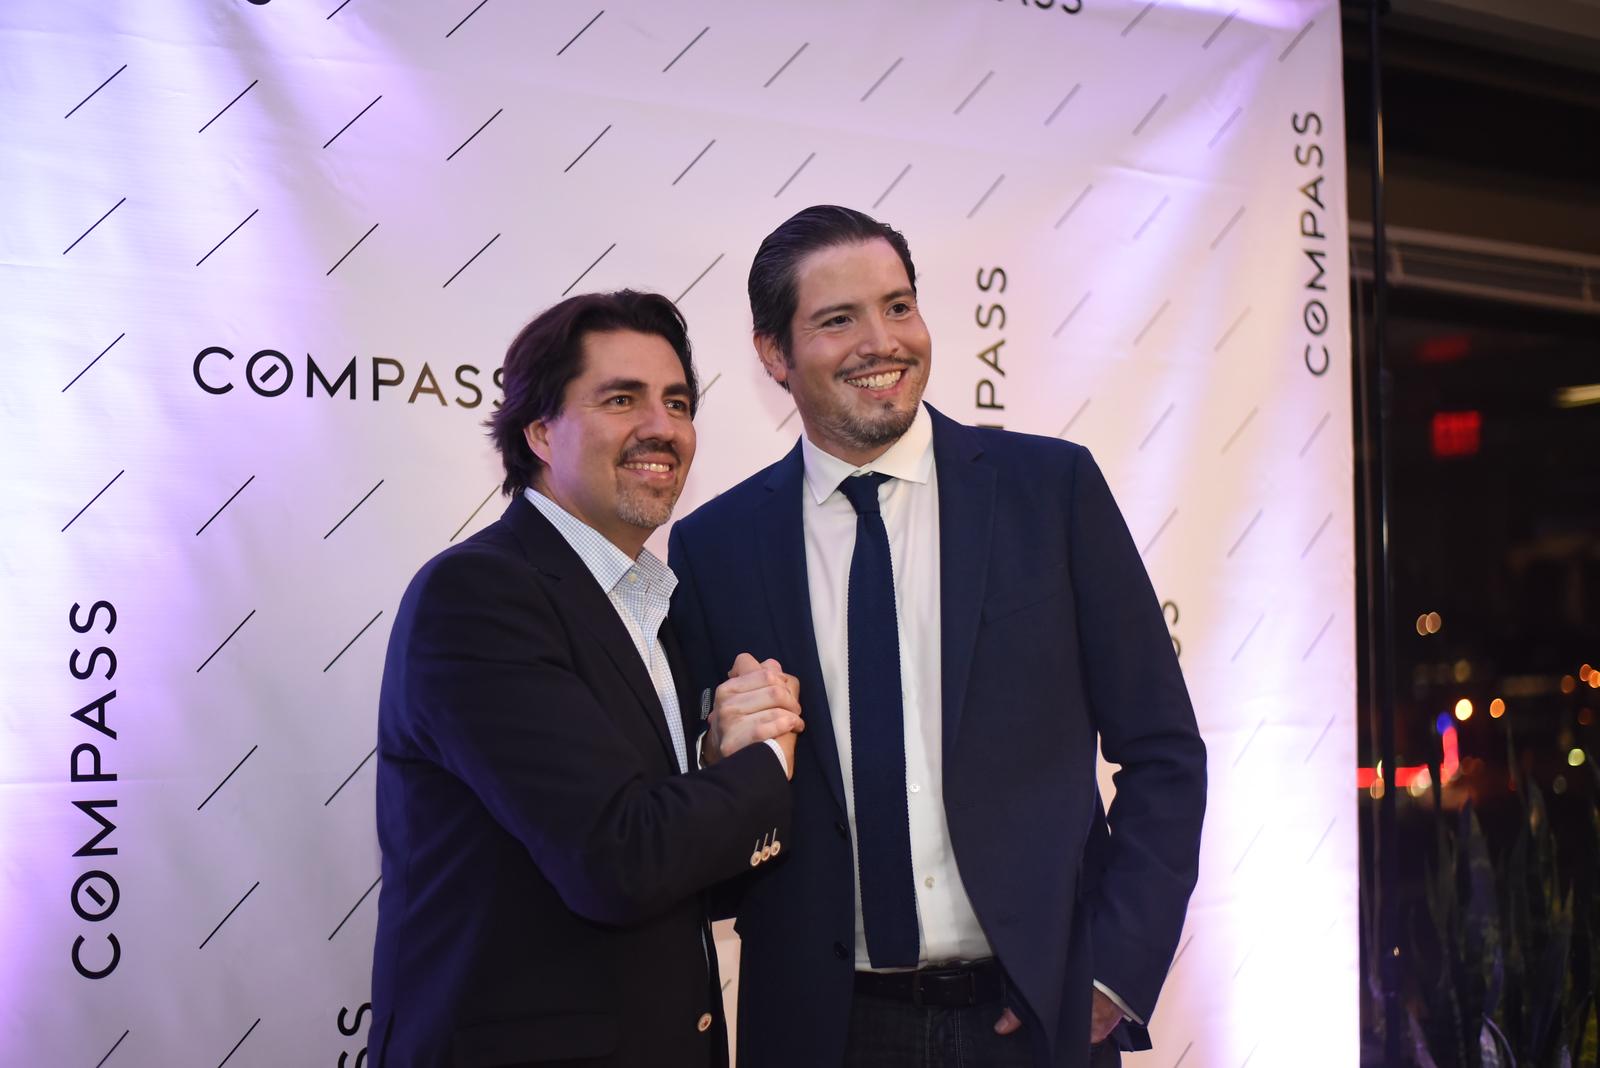 Andre Perez, Sebastian Martinez. Compass Real Estate Arlington Opening. February 22, 2018. Amanda Warden.